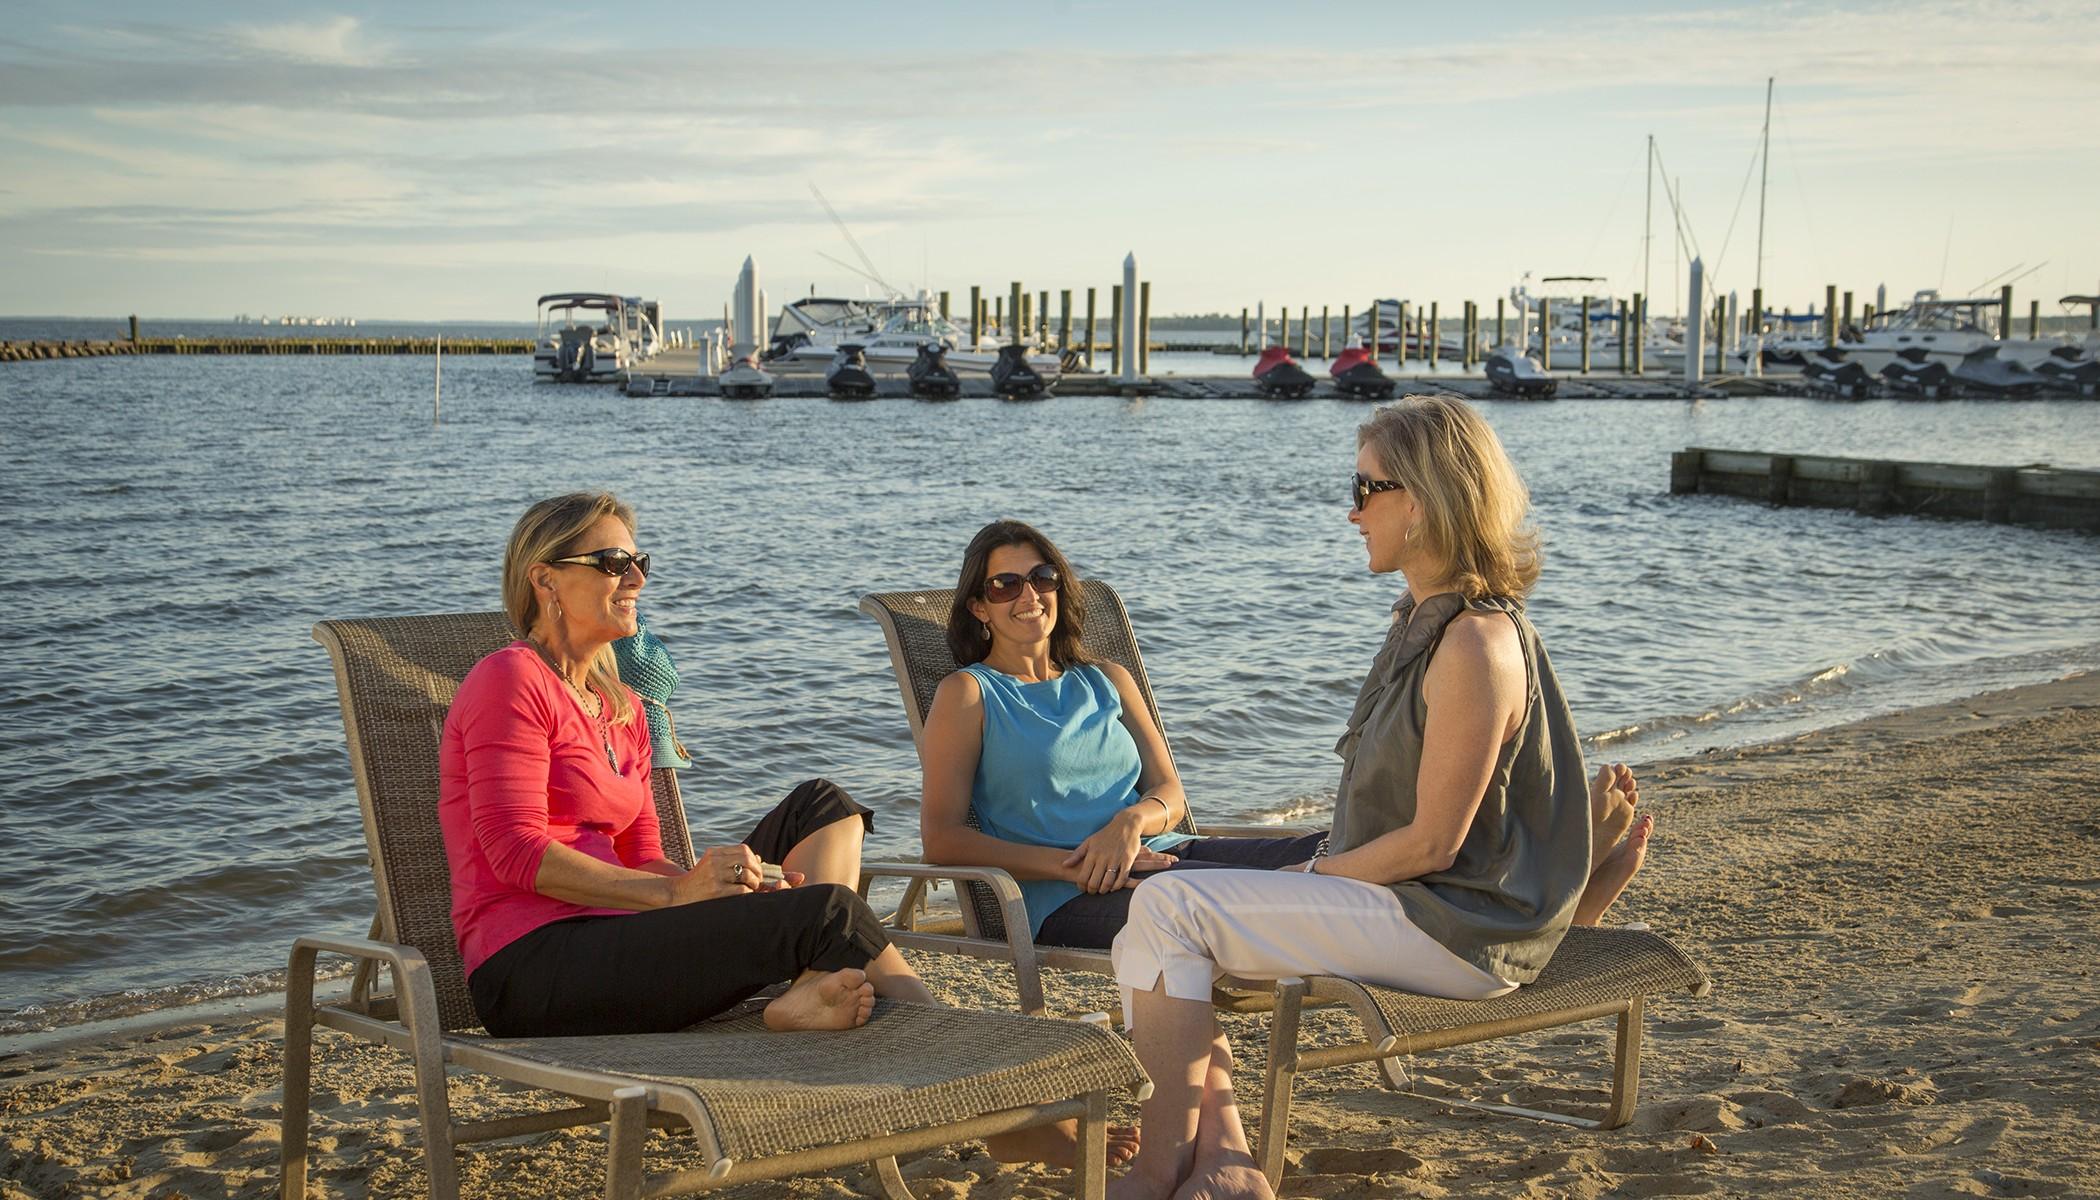 3 Women Socializing on the beach